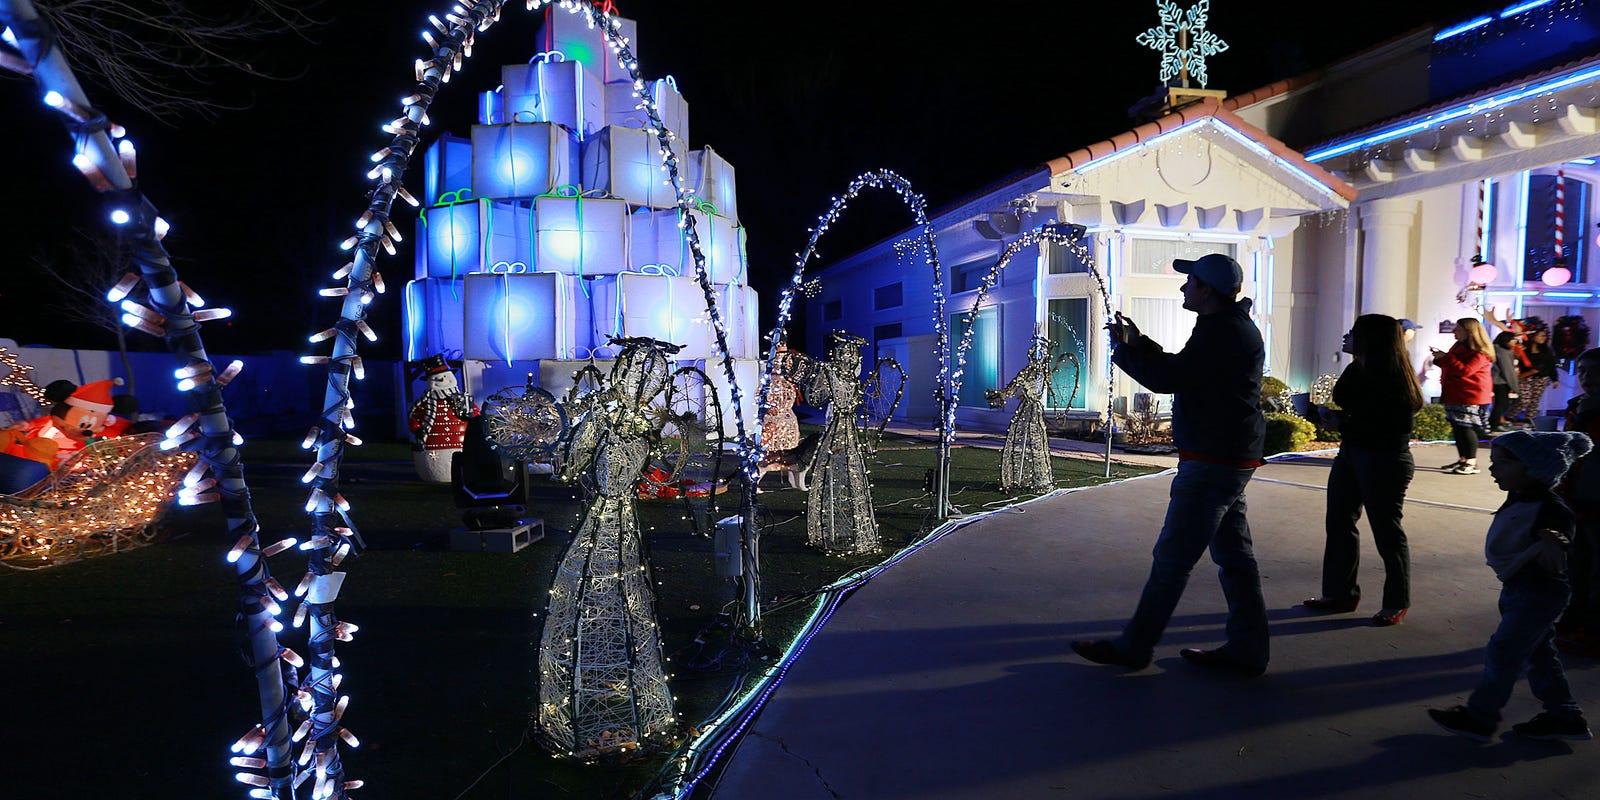 Fred Loya Light Show 2020.Popular Fred Loya Lights Show Kicks Off Soon